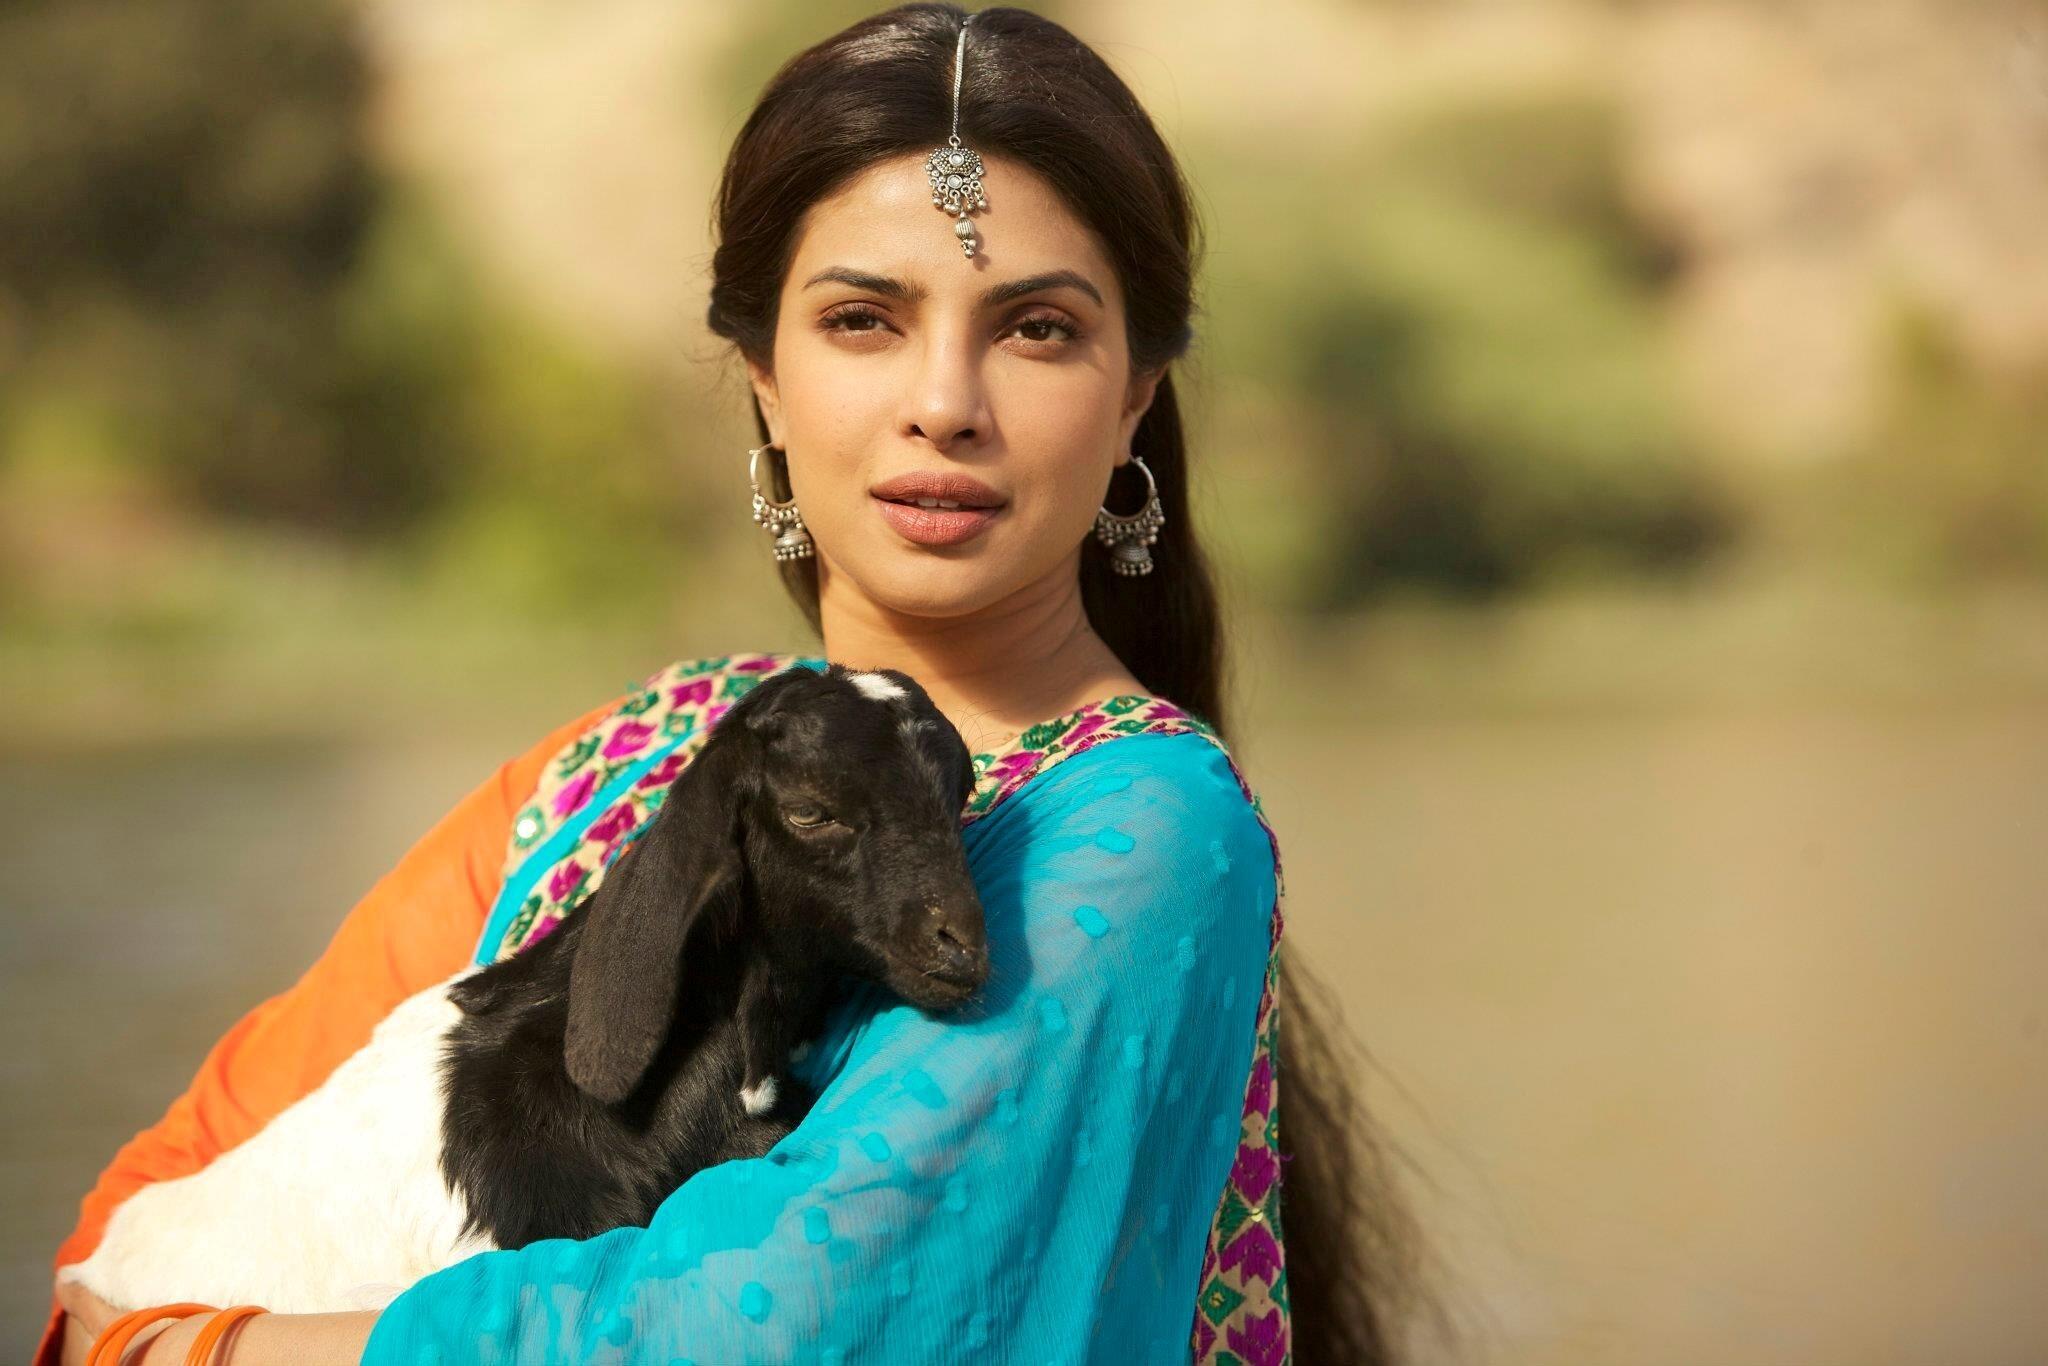 priyanka chopra in saree | hd wallpapers